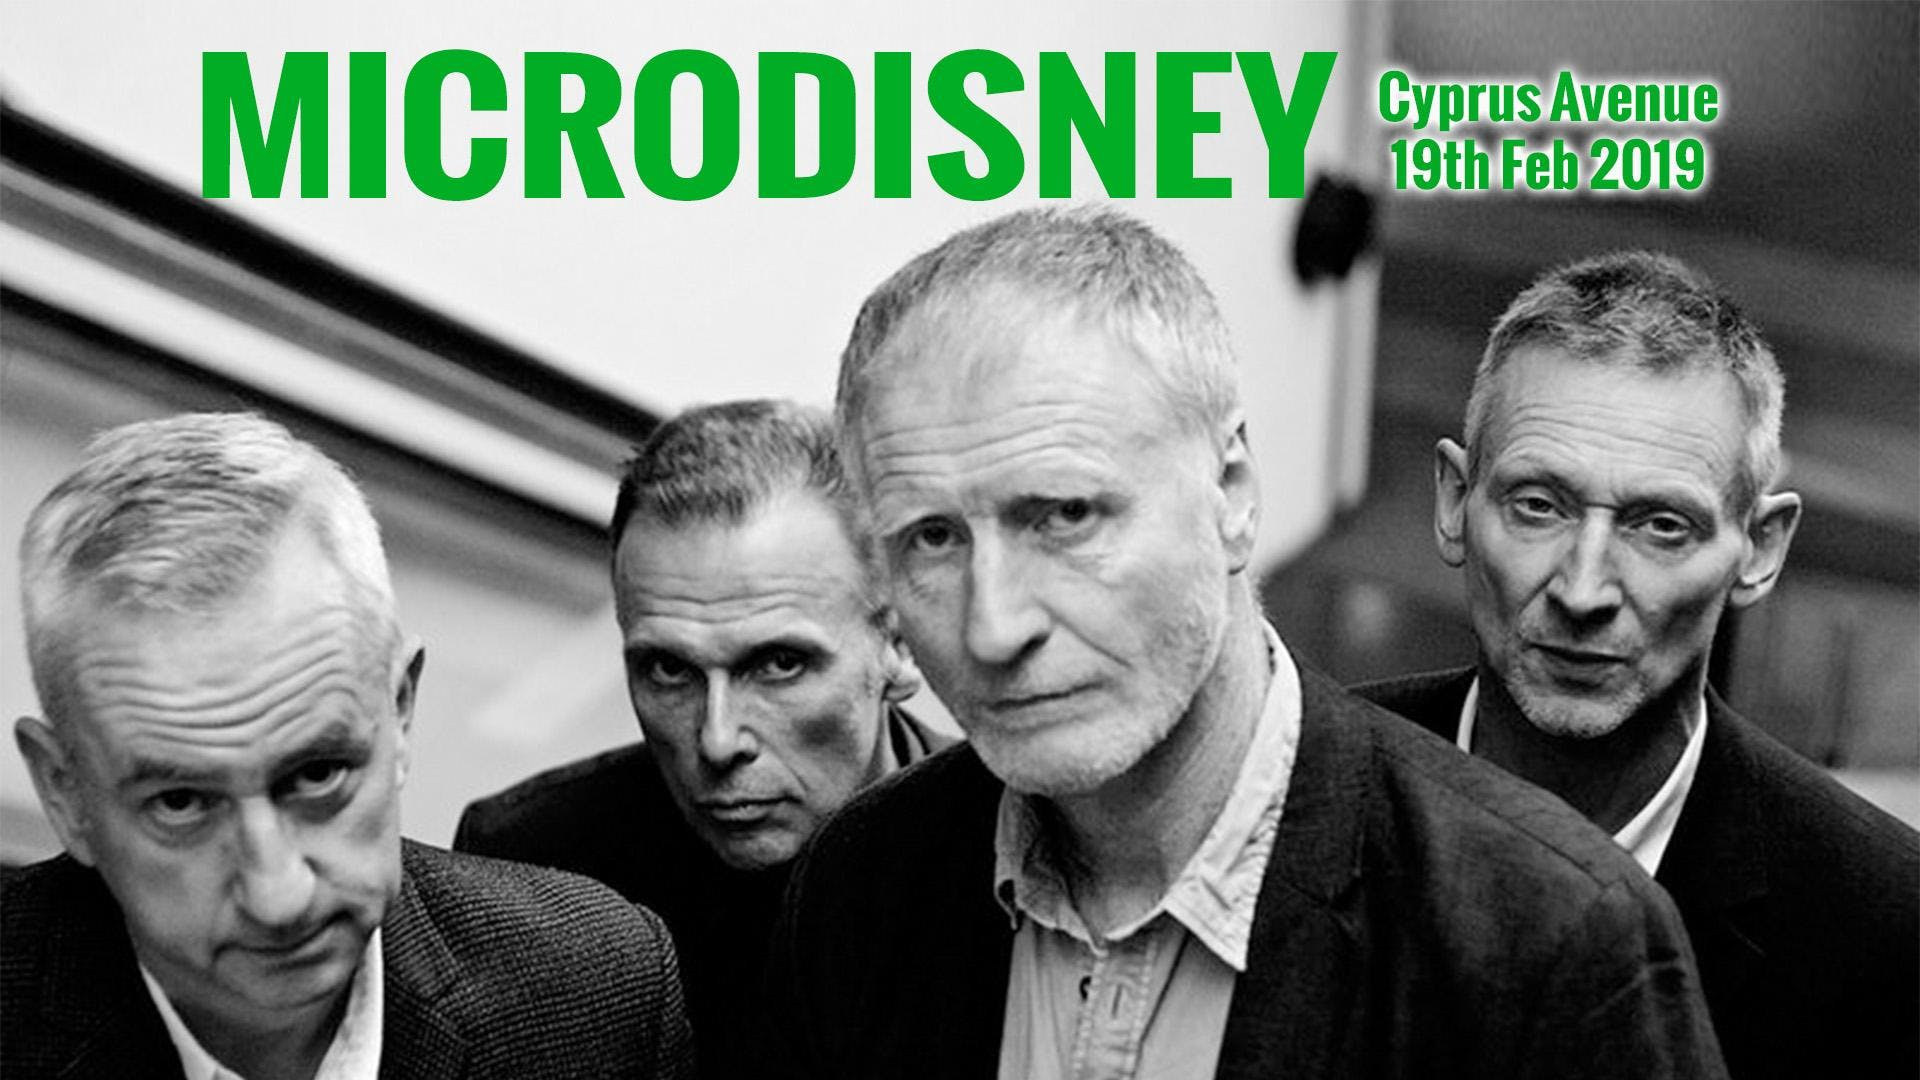 MICRODISNEY  - last ever show